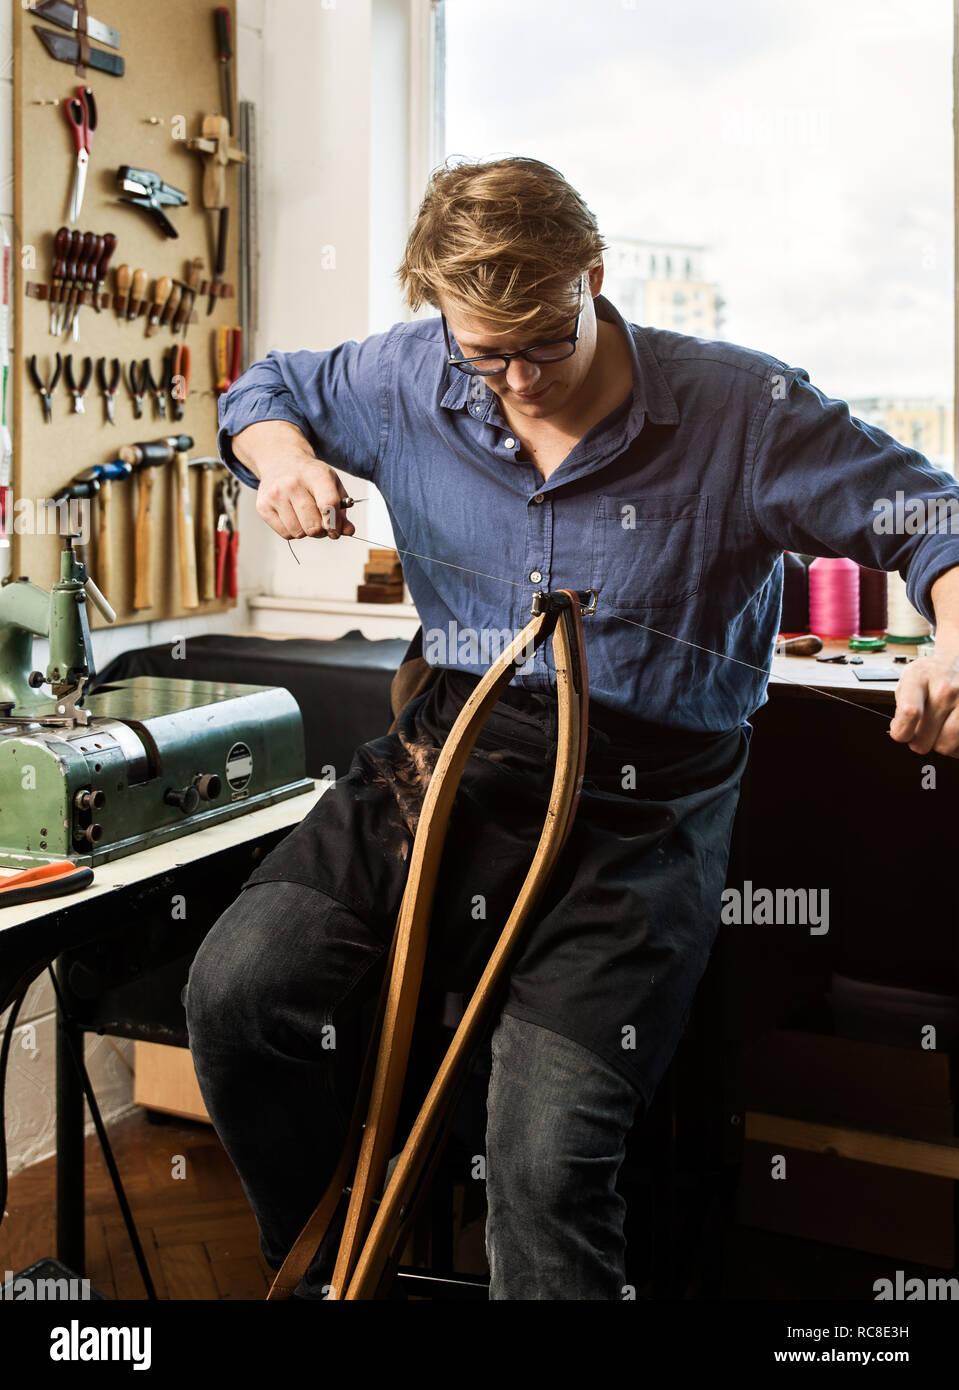 Sattler nähen Leder handtasche Gurte in Werkstatt Stockfoto